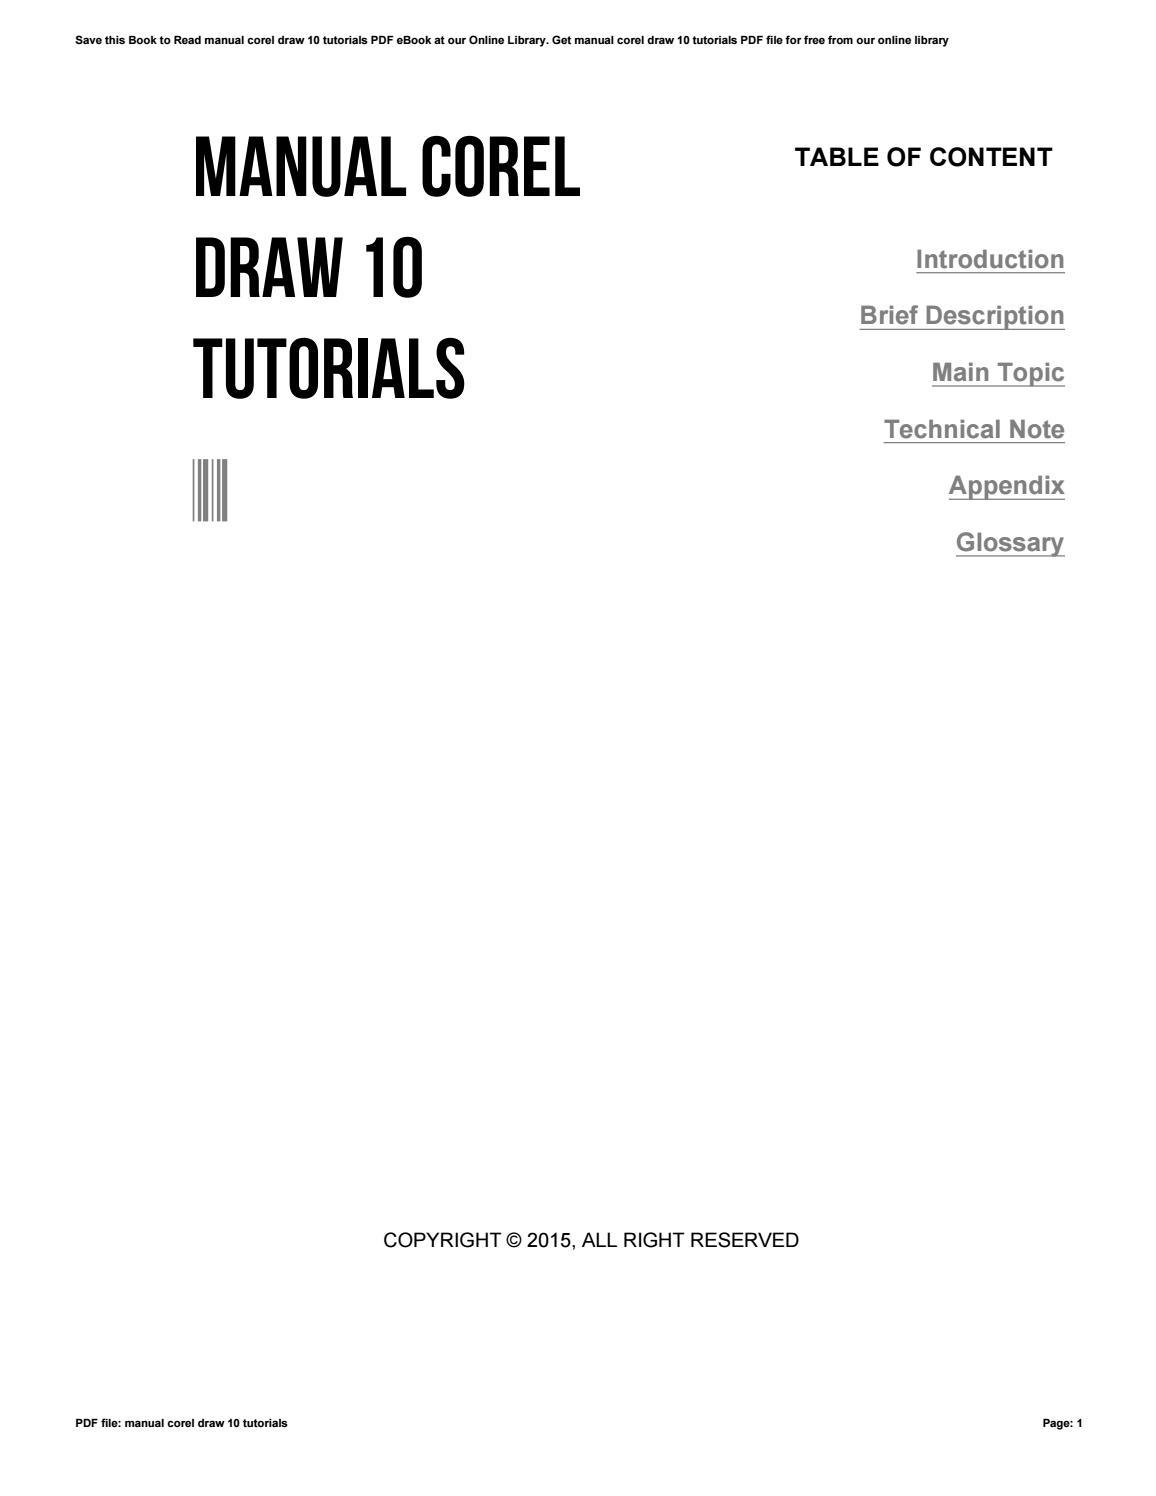 manual corel draw 10 tutorials by apssdc368 issuu rh issuu com